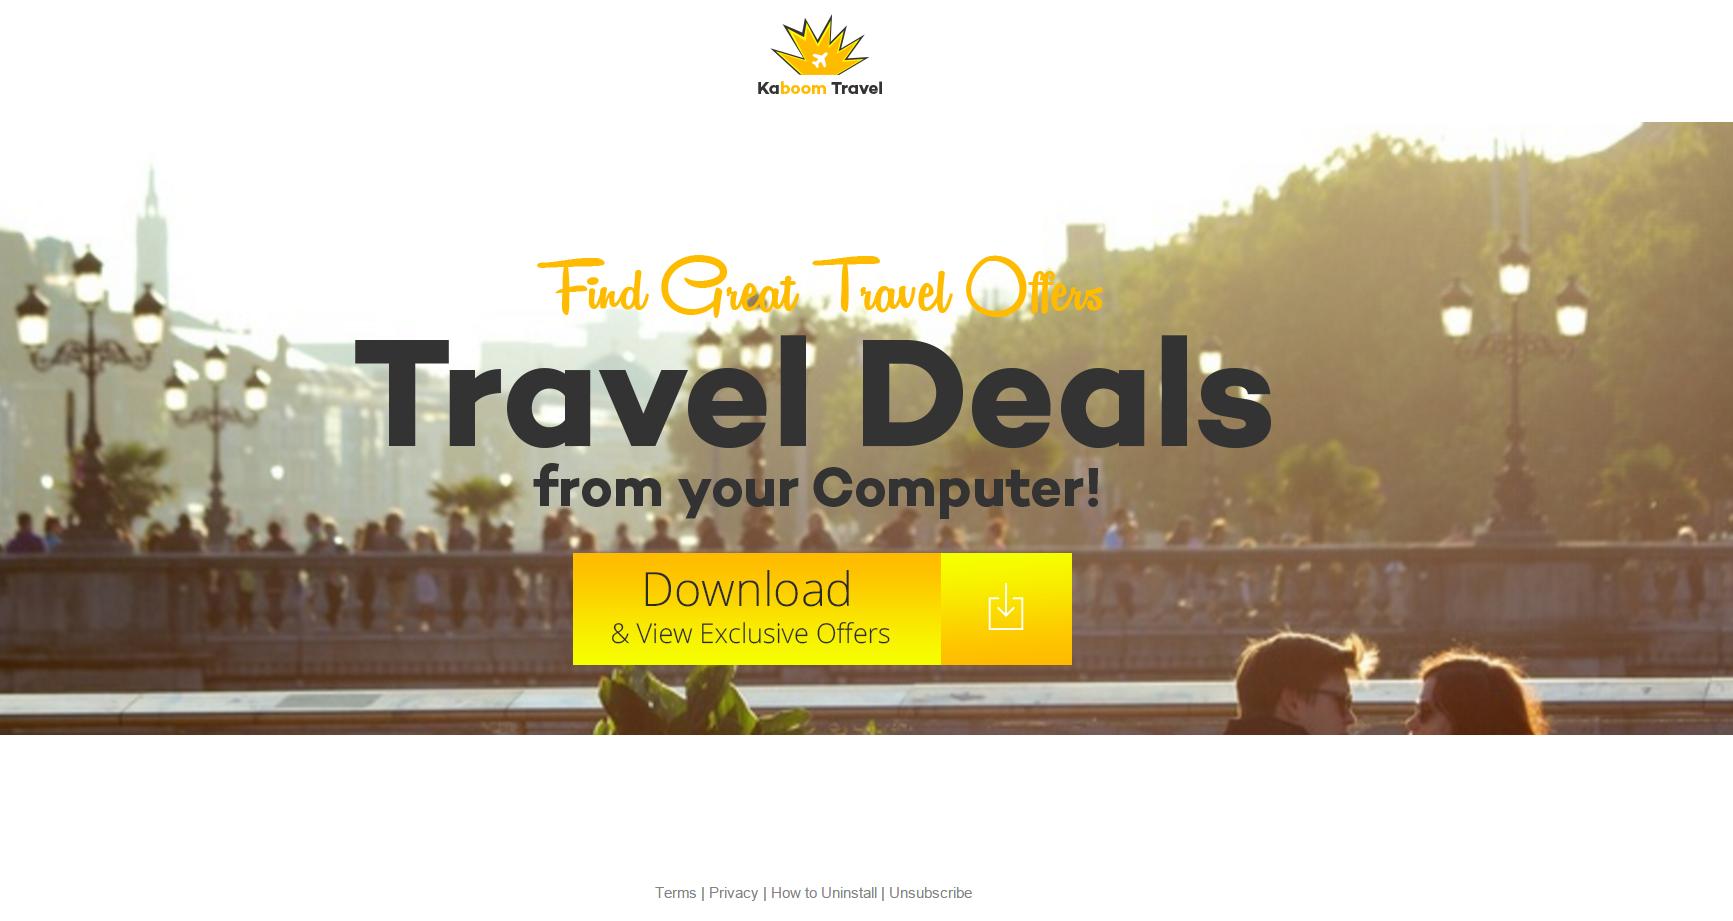 Kaboom Travel Deals Ads